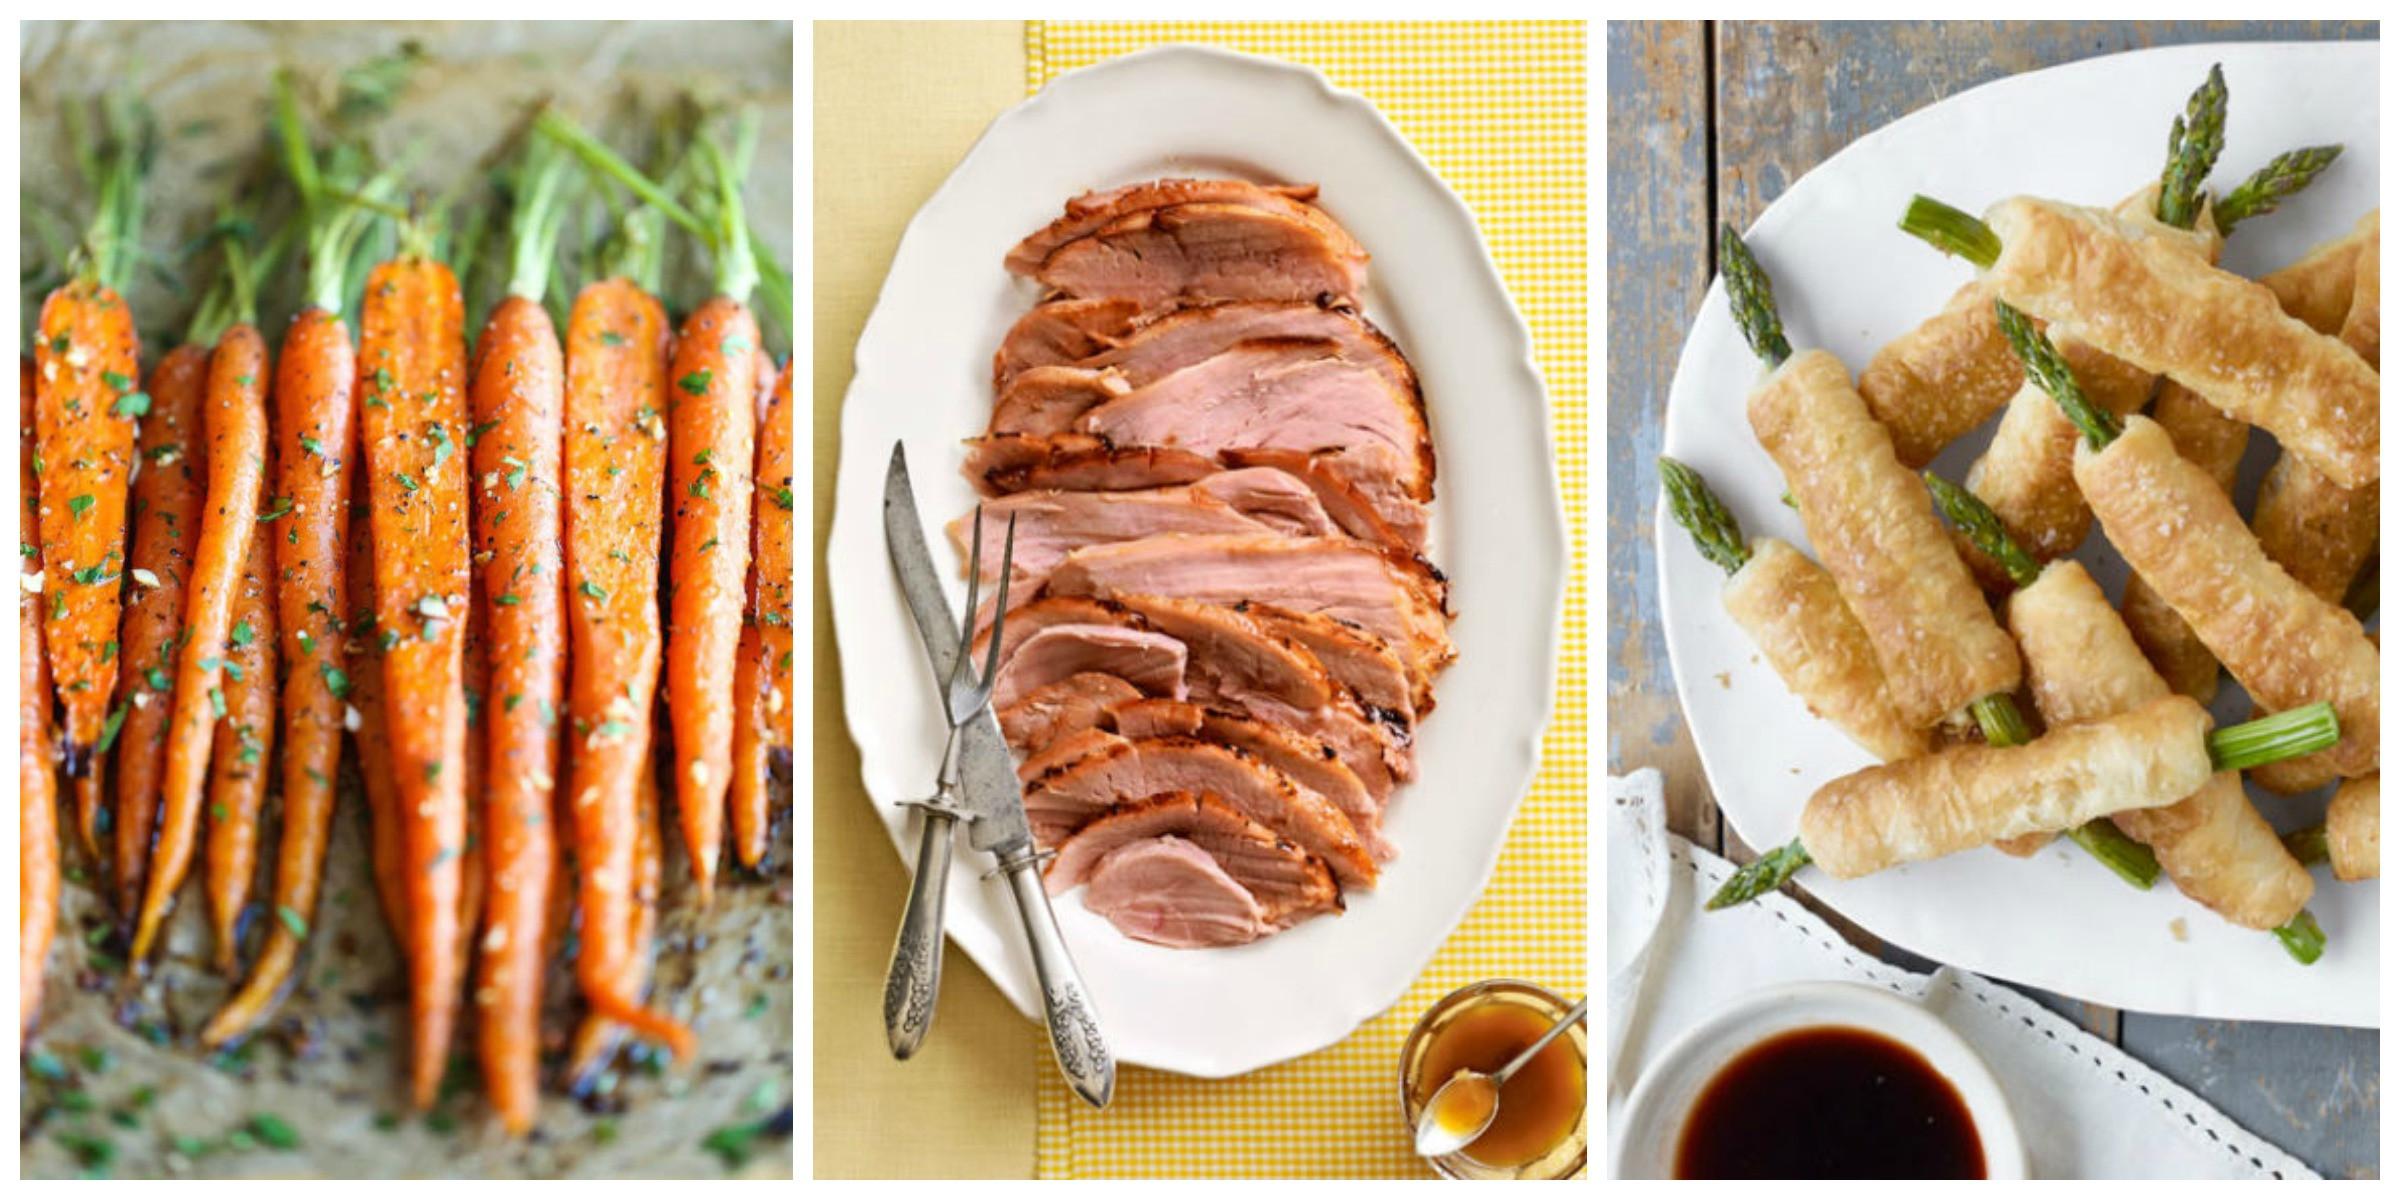 Easter Dinner Pictures  70 Easter Dinner Recipes & Food Ideas Easter Menu